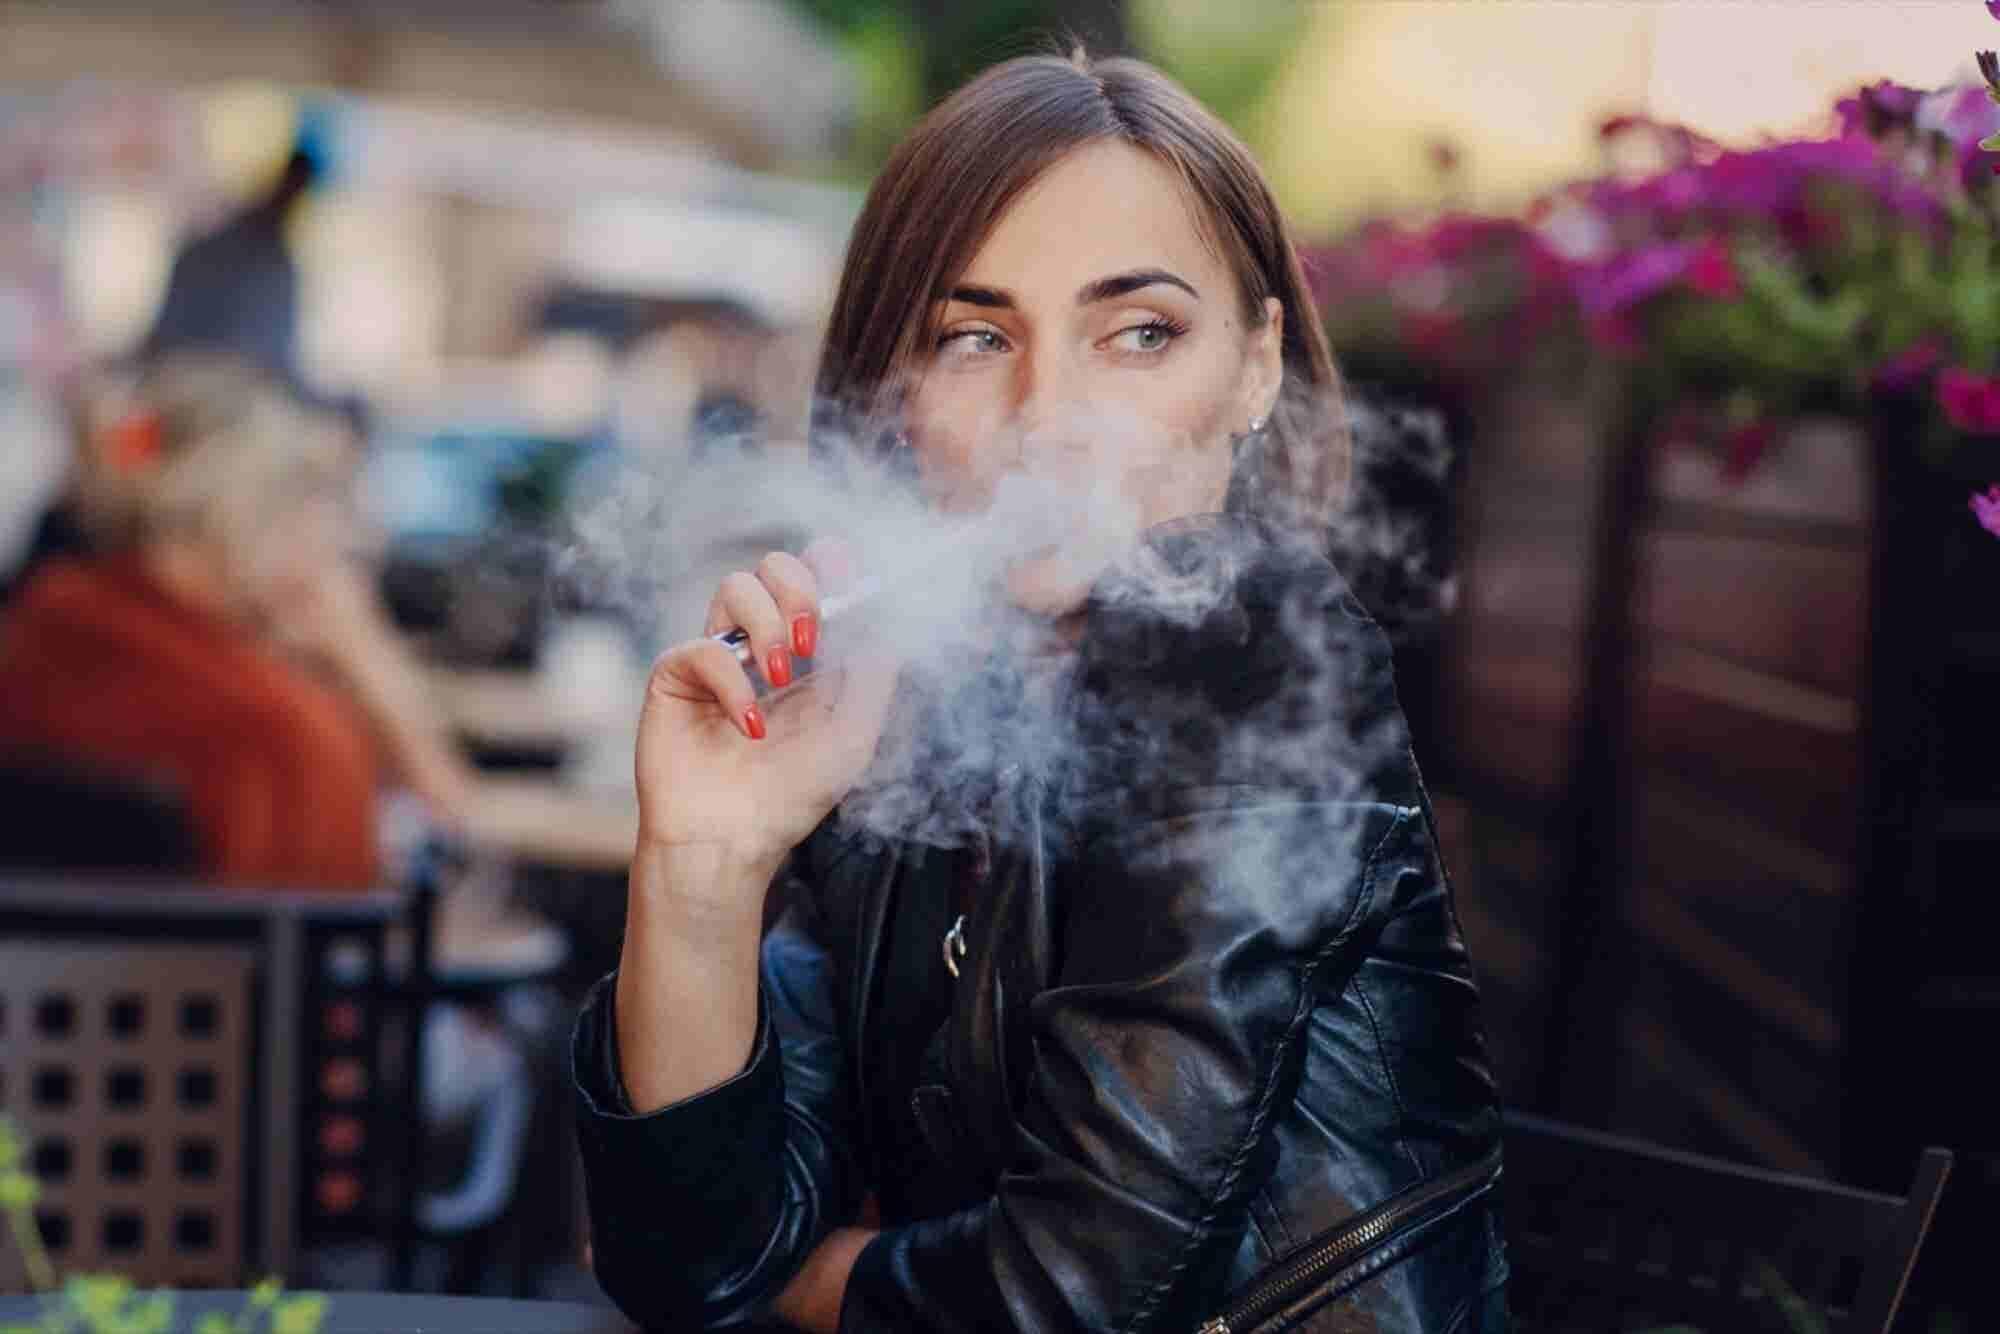 Philip Morris Wins Missouri Class Action Trial Over 'Light' Cigarettes